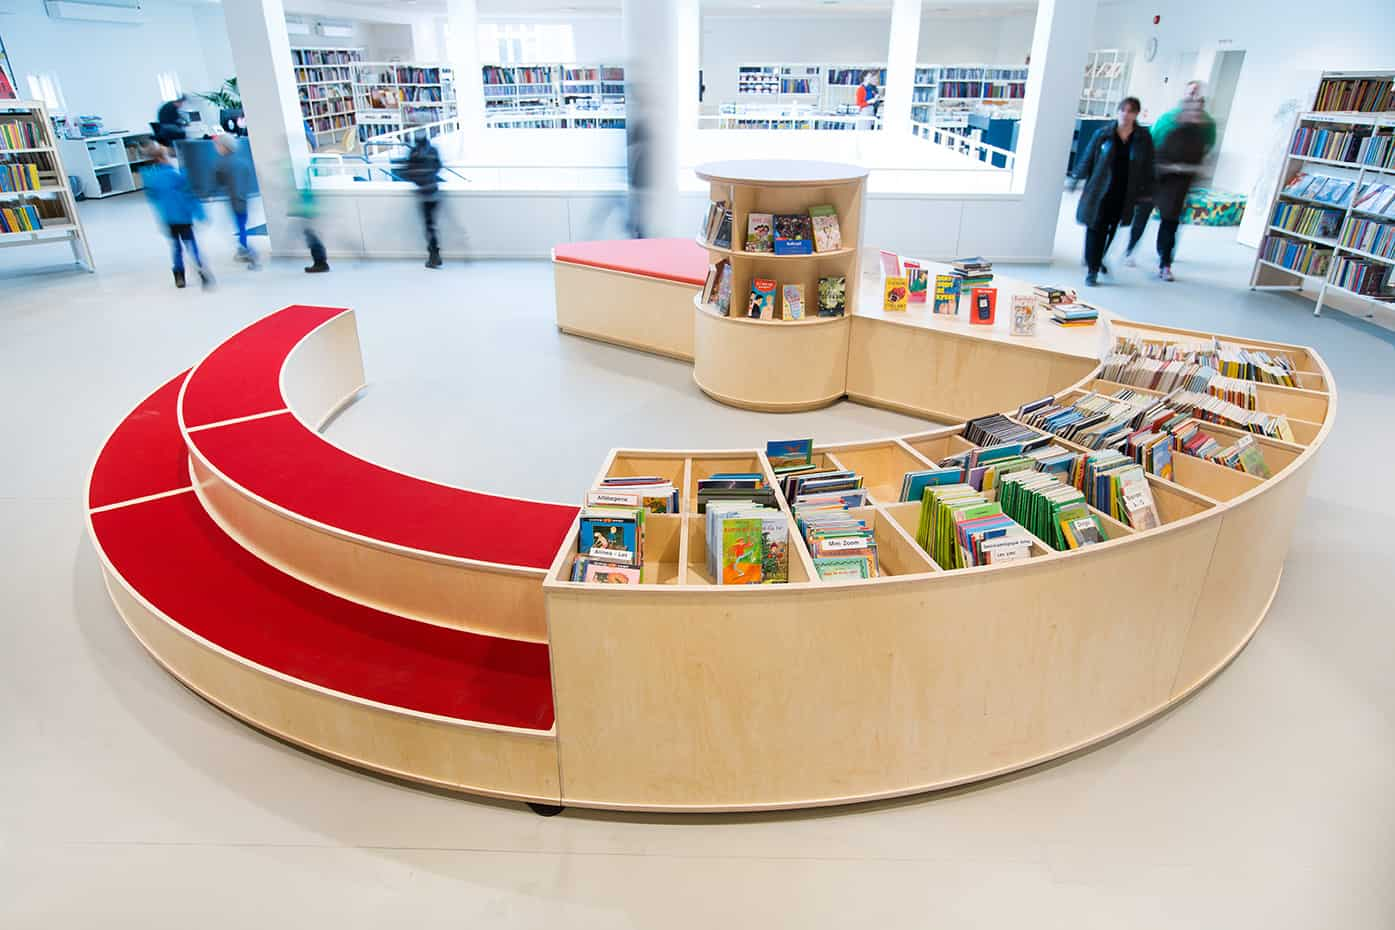 RITAarch, Indretning, spaceplanning, biblioteksdesign, biblioteksindretning, wayfinding, grafik, spaceplanning, arkitektur, børnebibliotek, specialinventar, Holbæk bibliotek